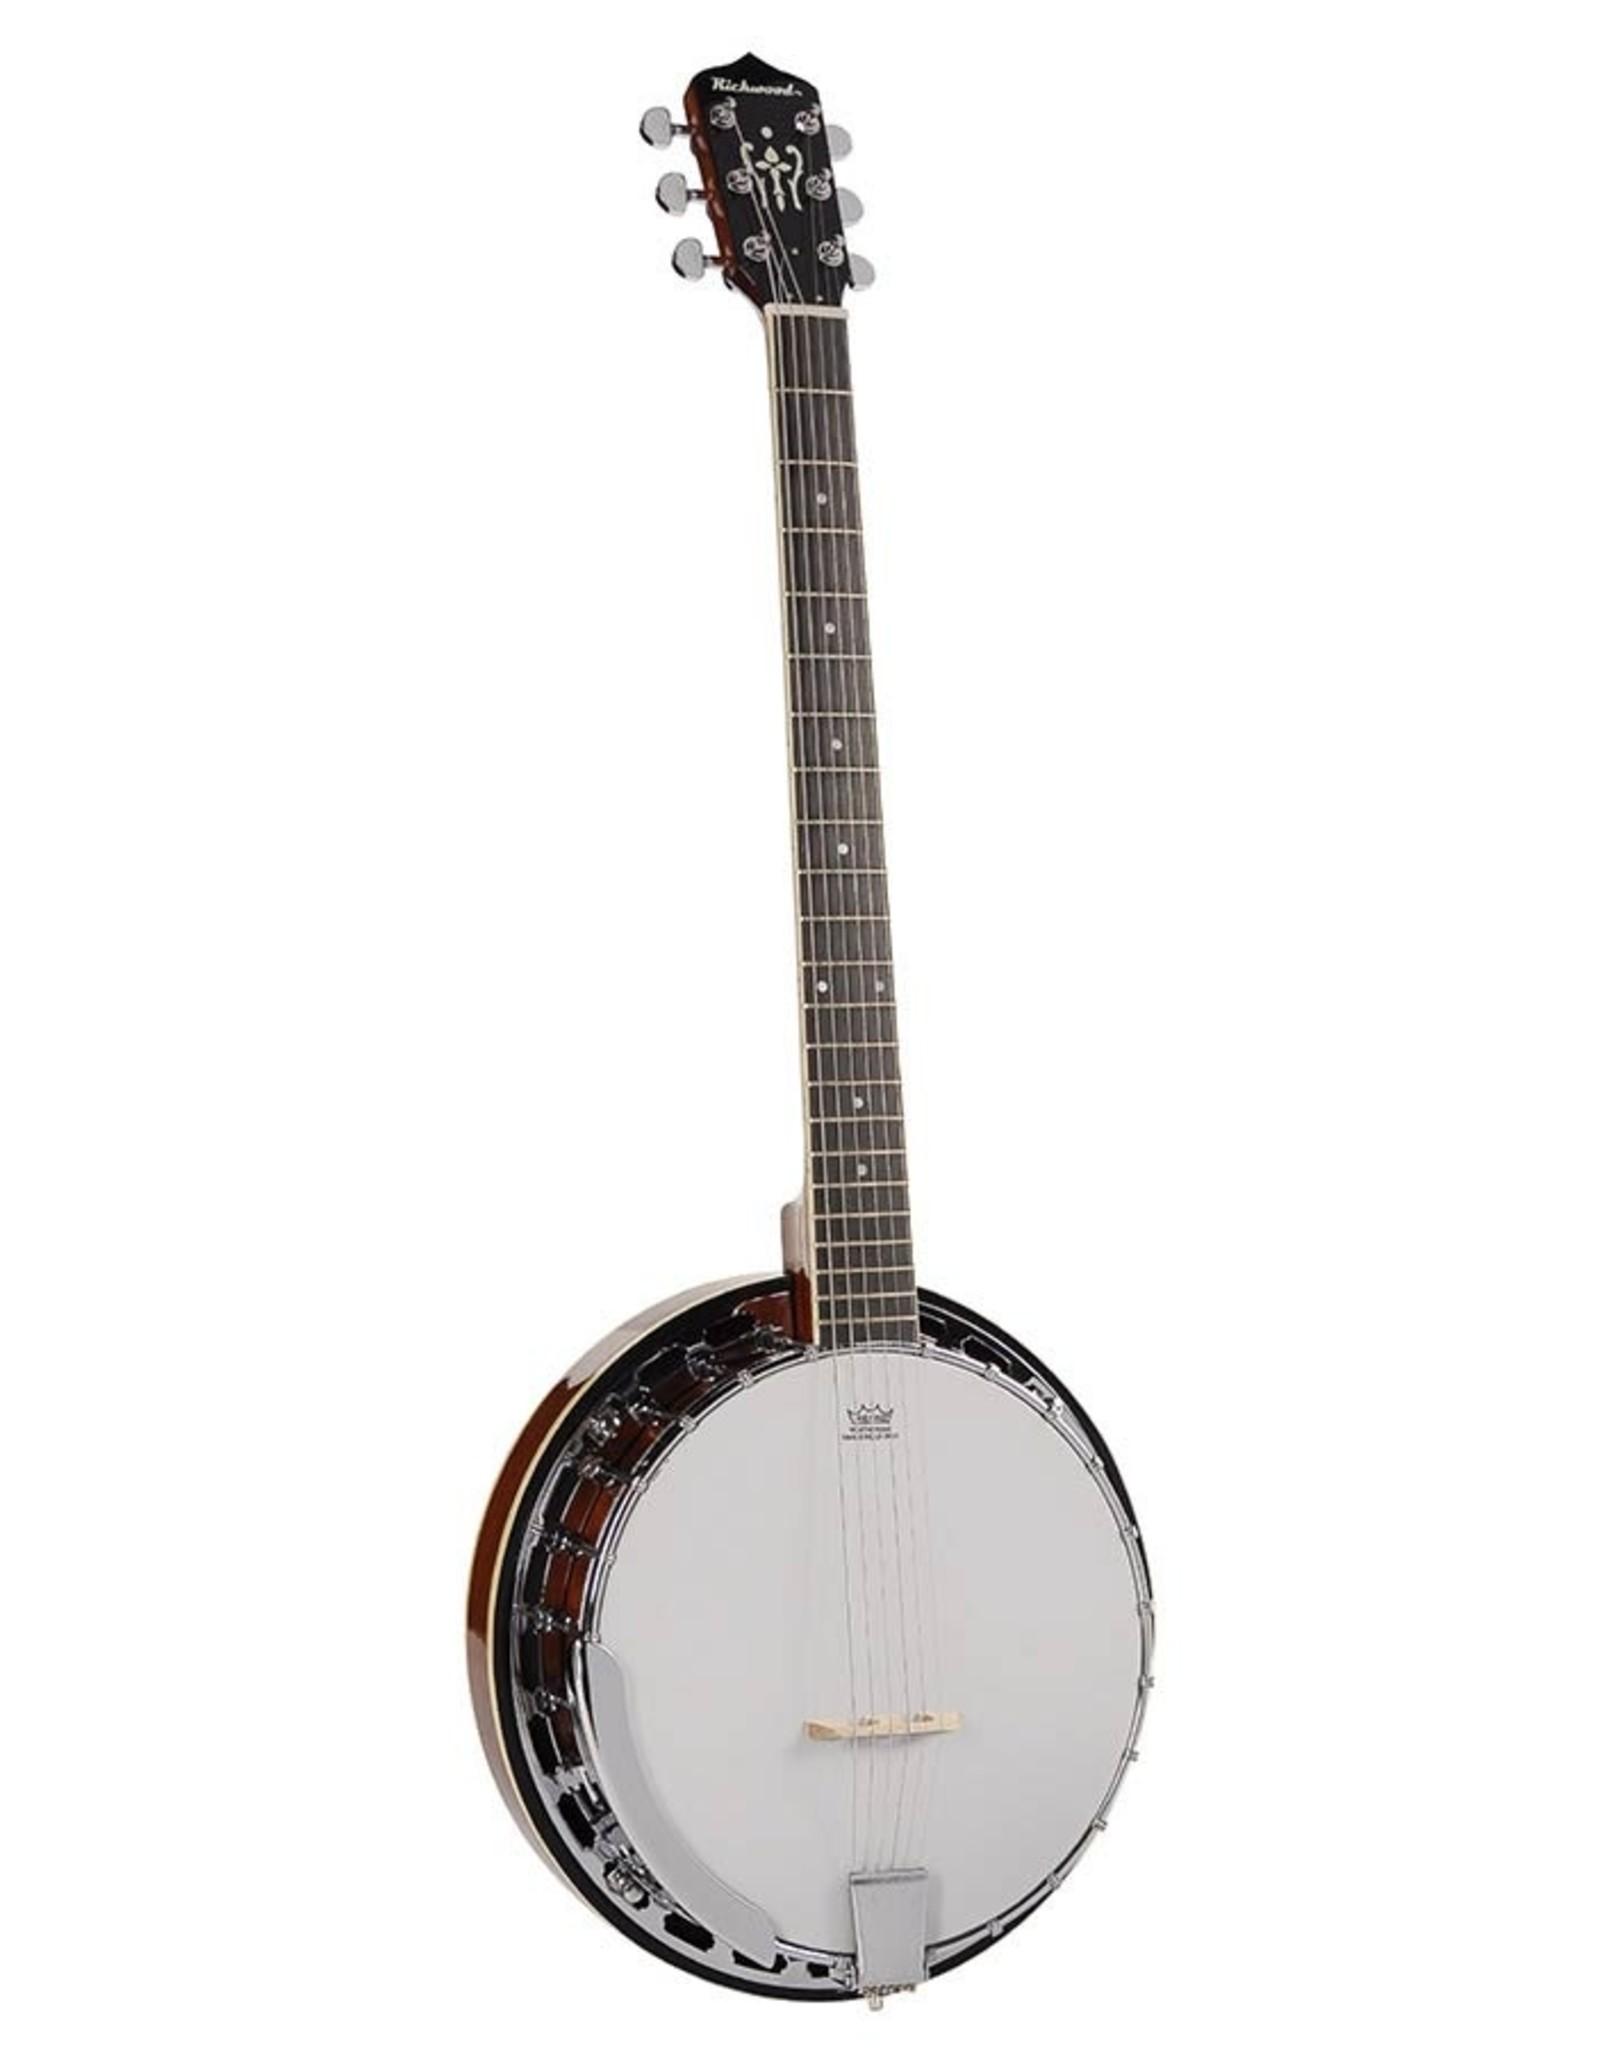 Richwood Richwood RMB-606 6-s narige gitaarbanjo